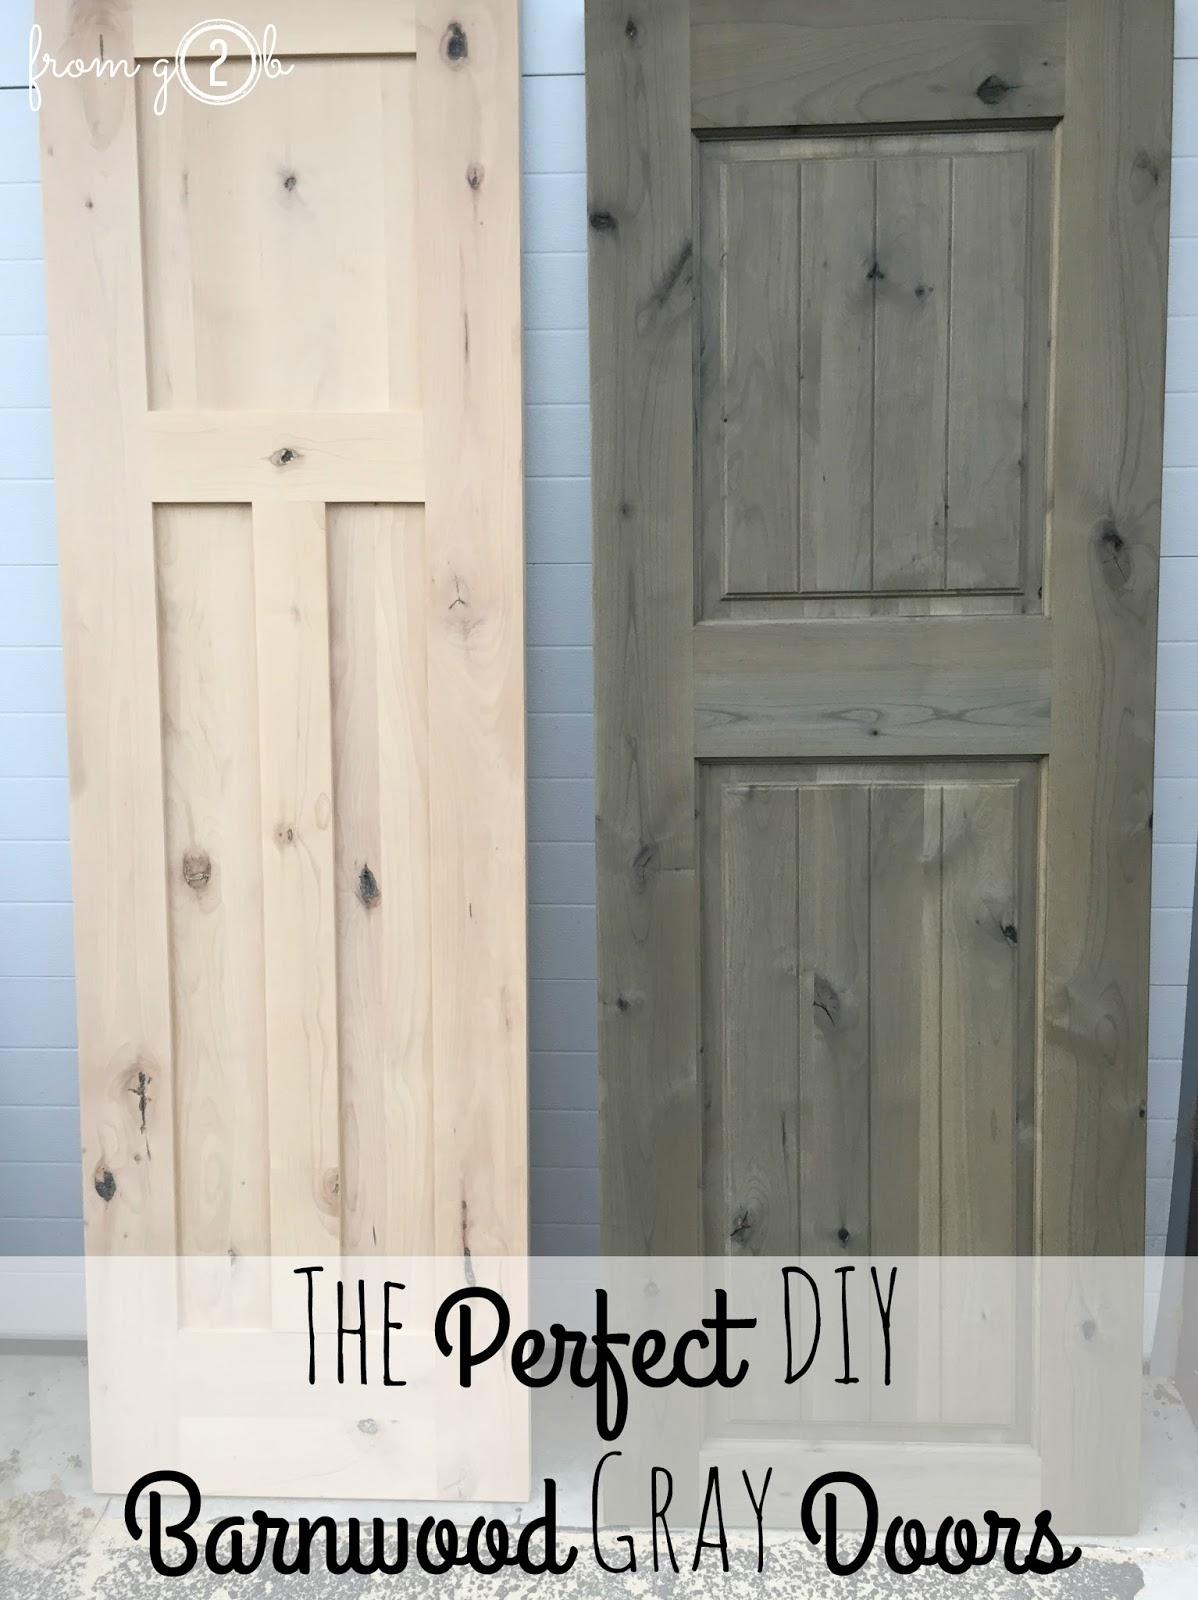 November 11 2015 & from Gardners 2 Bergers: The Perfect DIY Barnwood Gray Doors